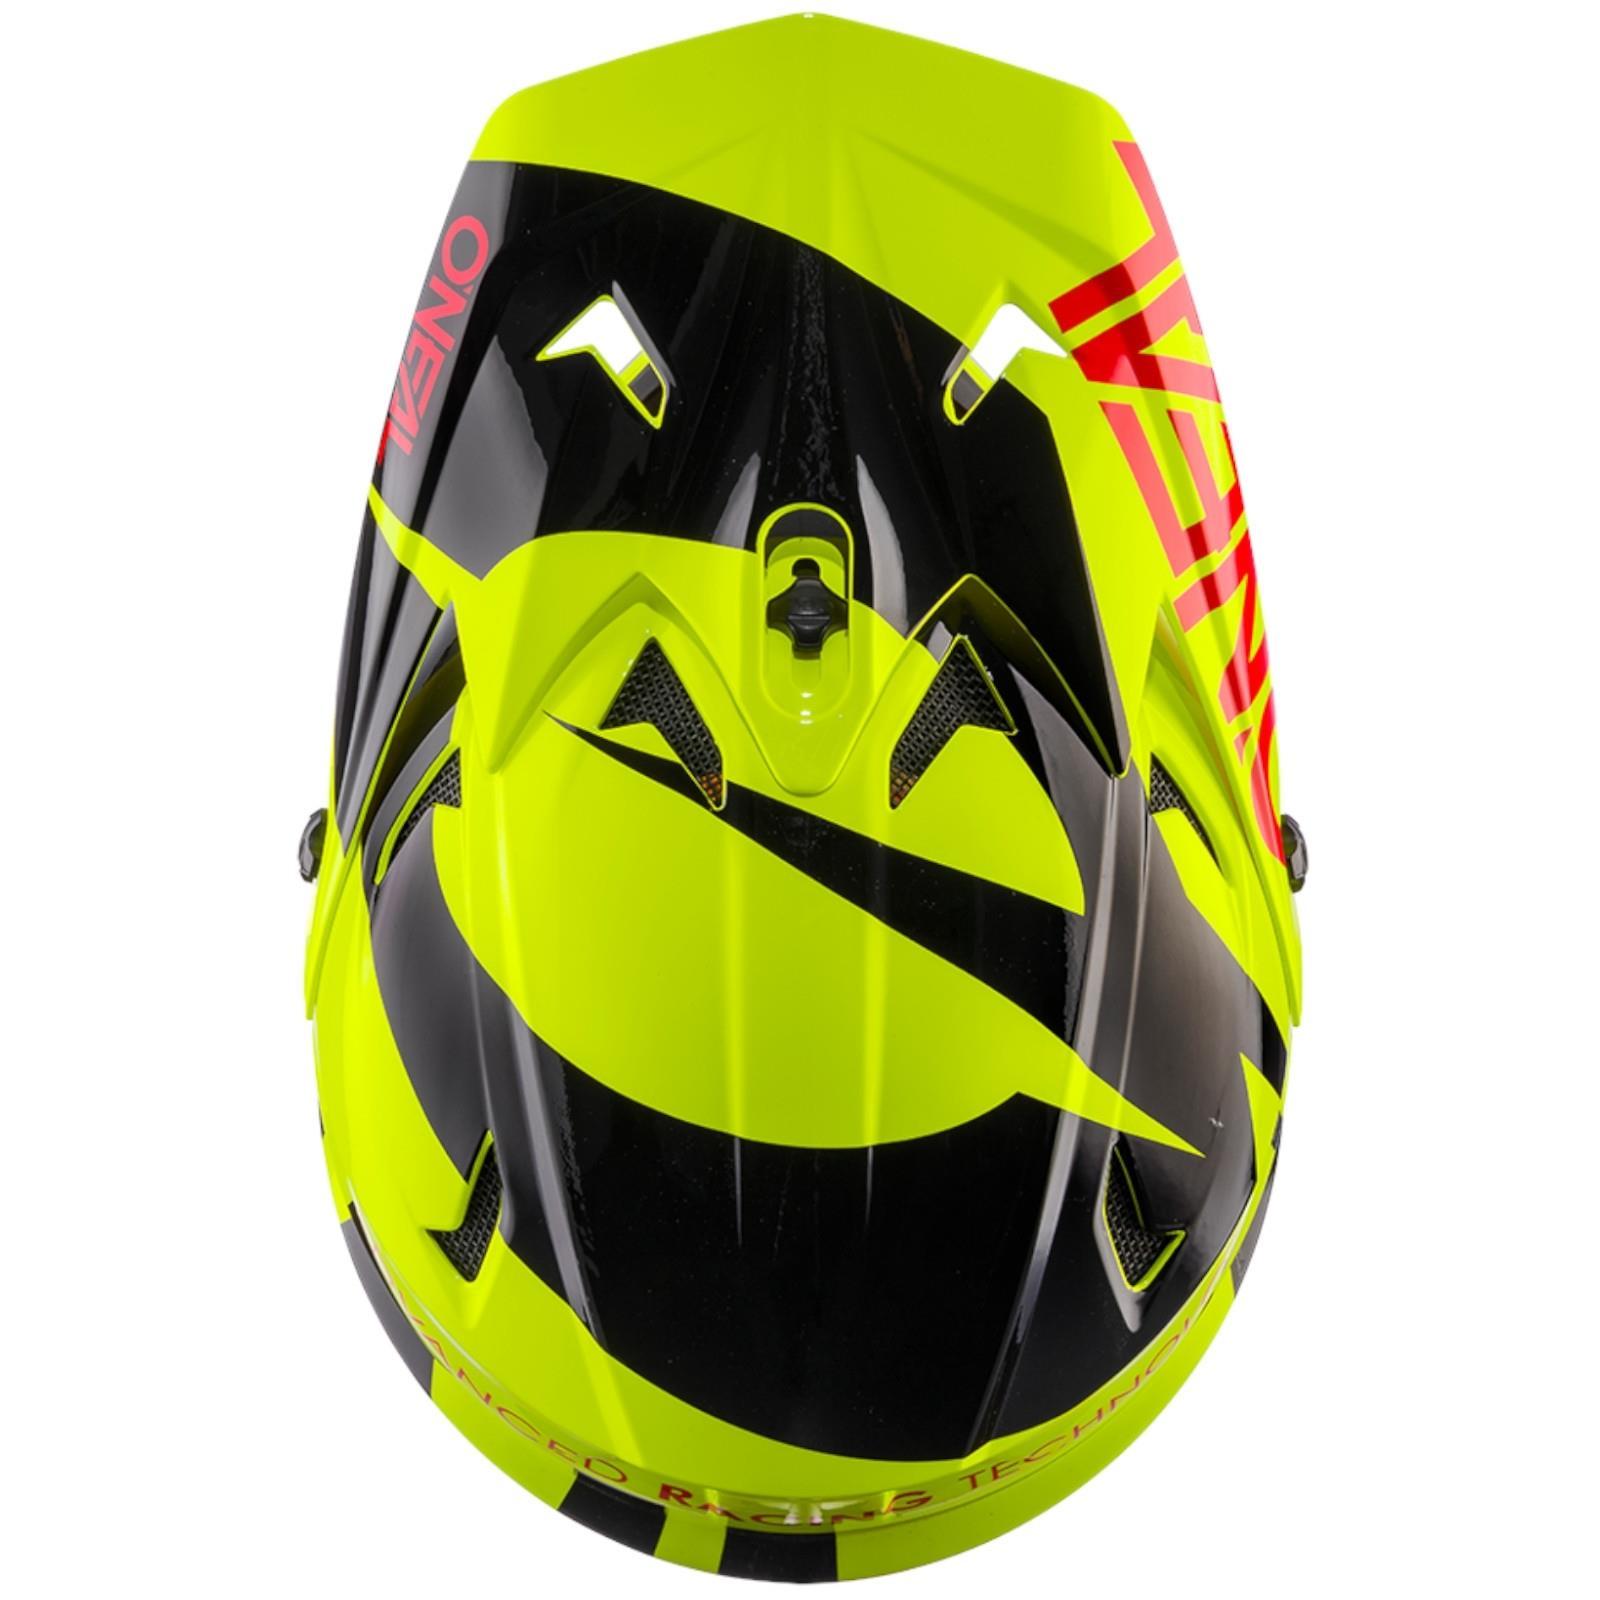 O/'Neal Backflip RL2 Slick Fahrrad Helm Downhill MTB Mountain Bike FR DH Fullface